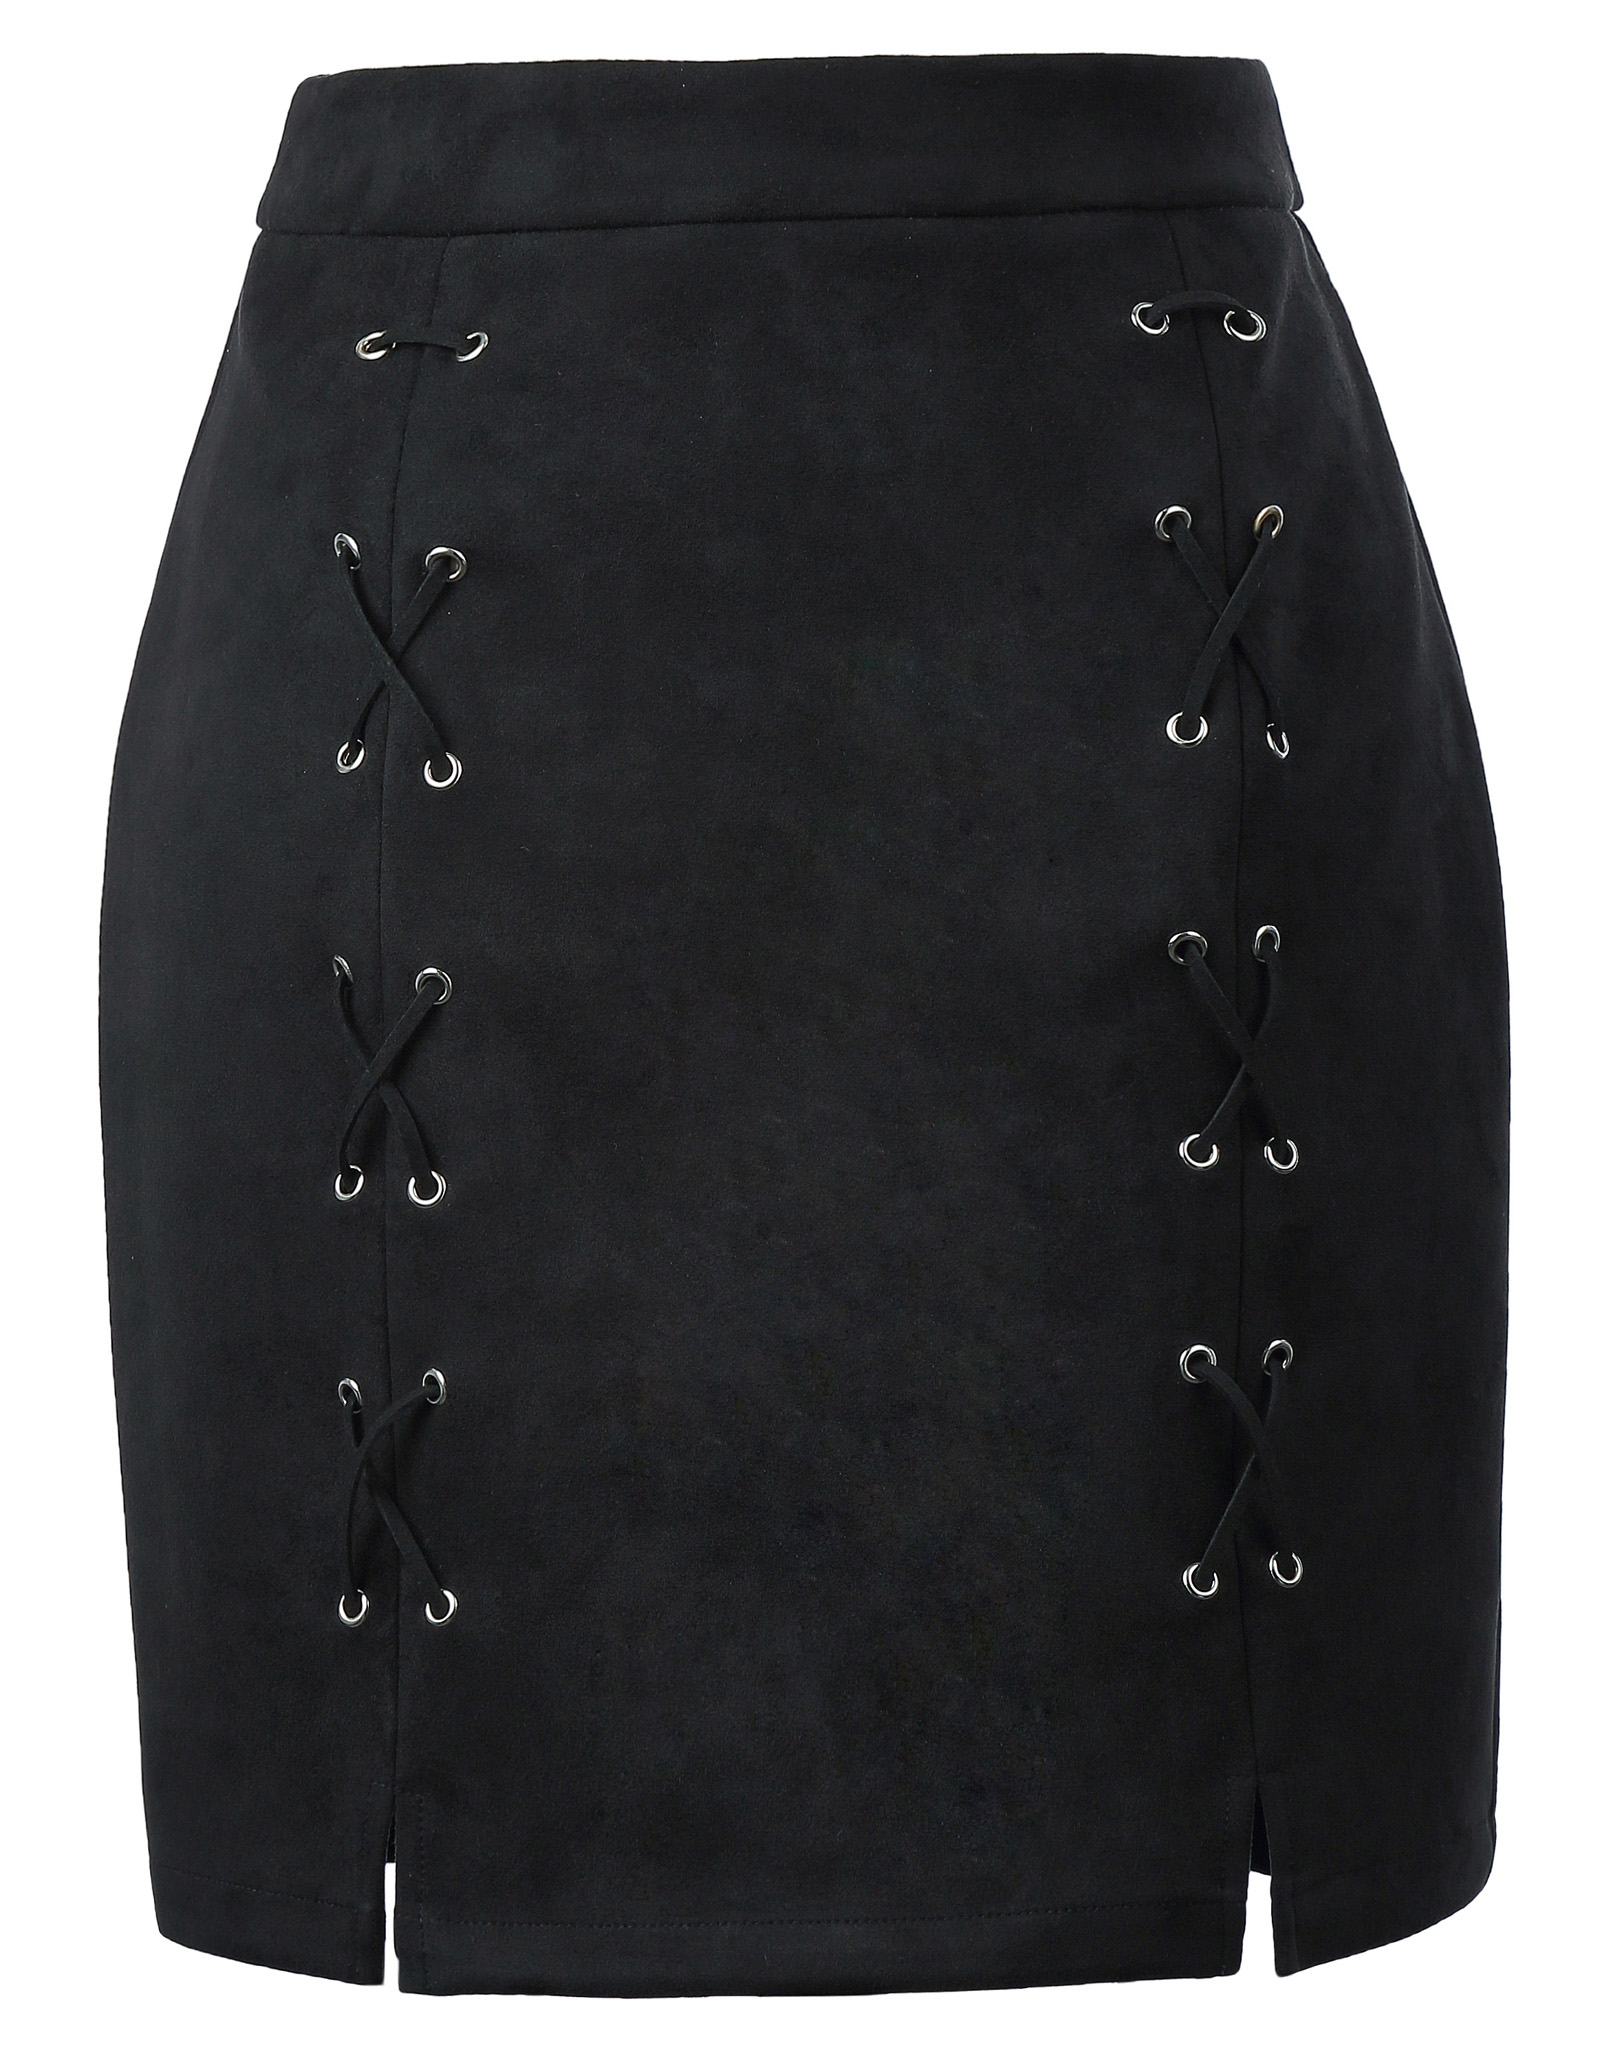 Kate Kasin Women Sexy Criss Cross Tight Bodycon High Waist Faux Suede Stretch Mini Skirt Lace Up Split Tight Mini Skirt